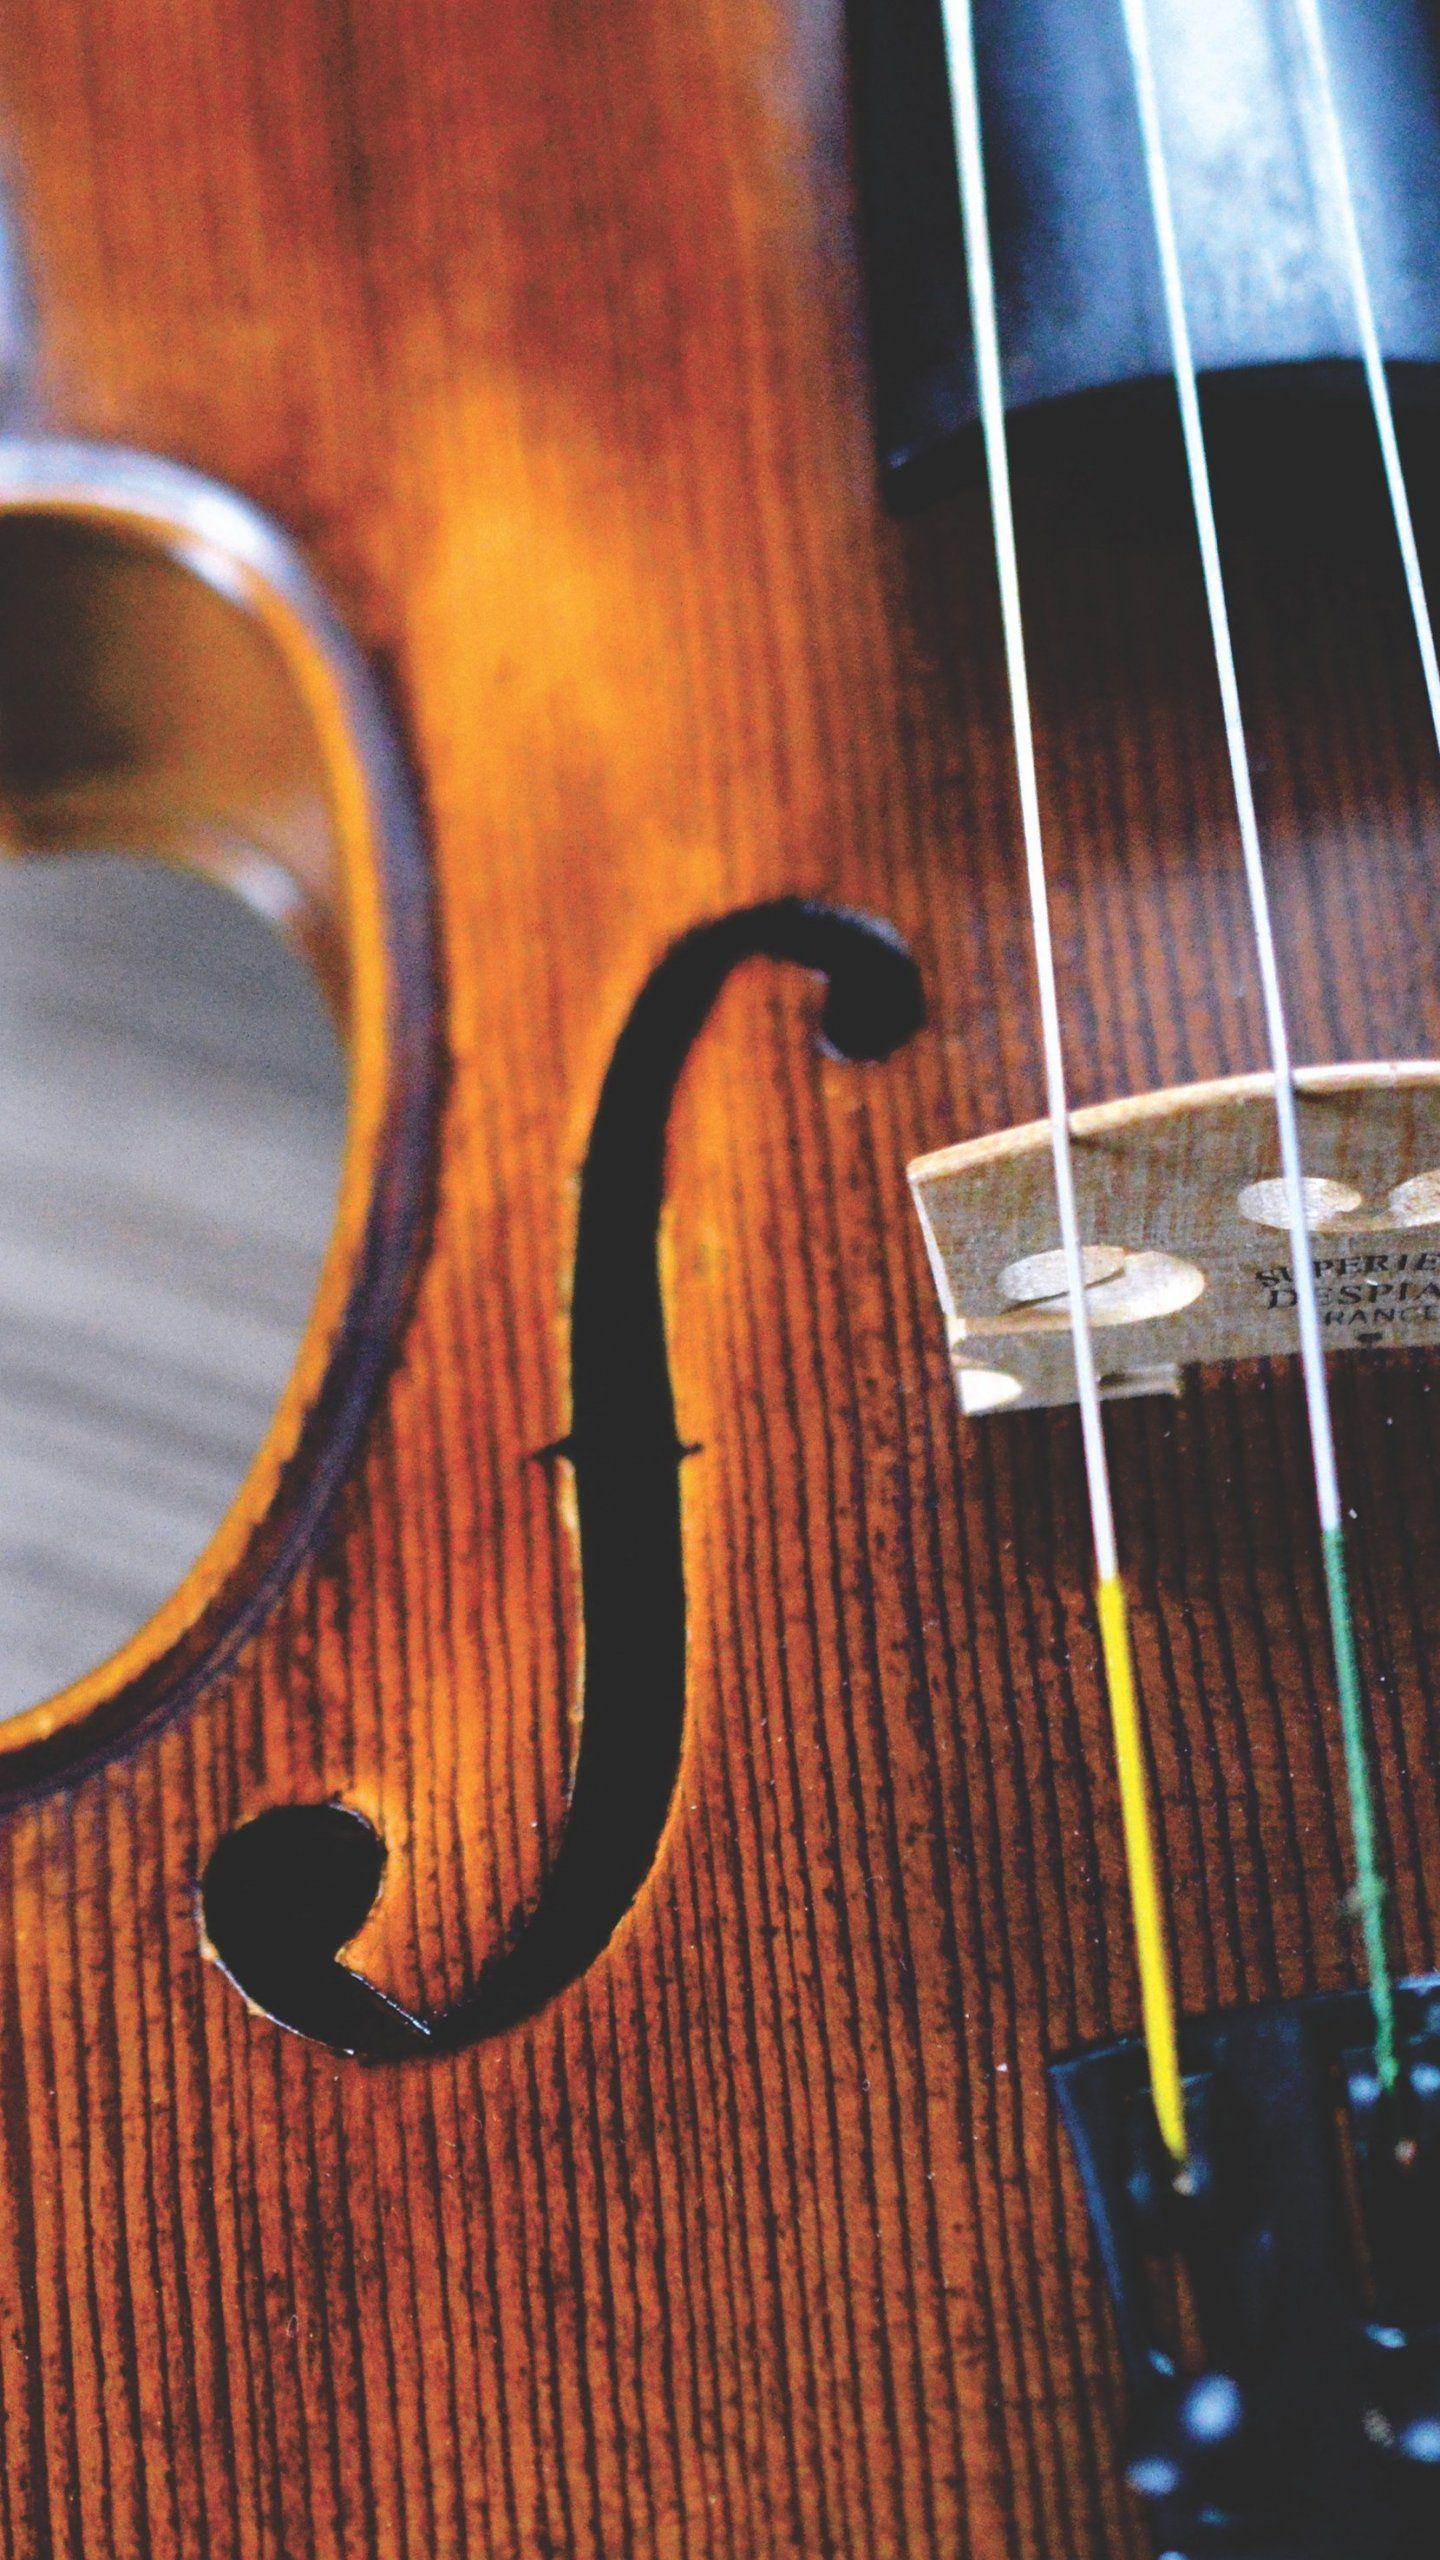 Violin Wallpaper Iphone Android Desktop Backgrounds Violin Music Wallpaper Iphone Wallpaper